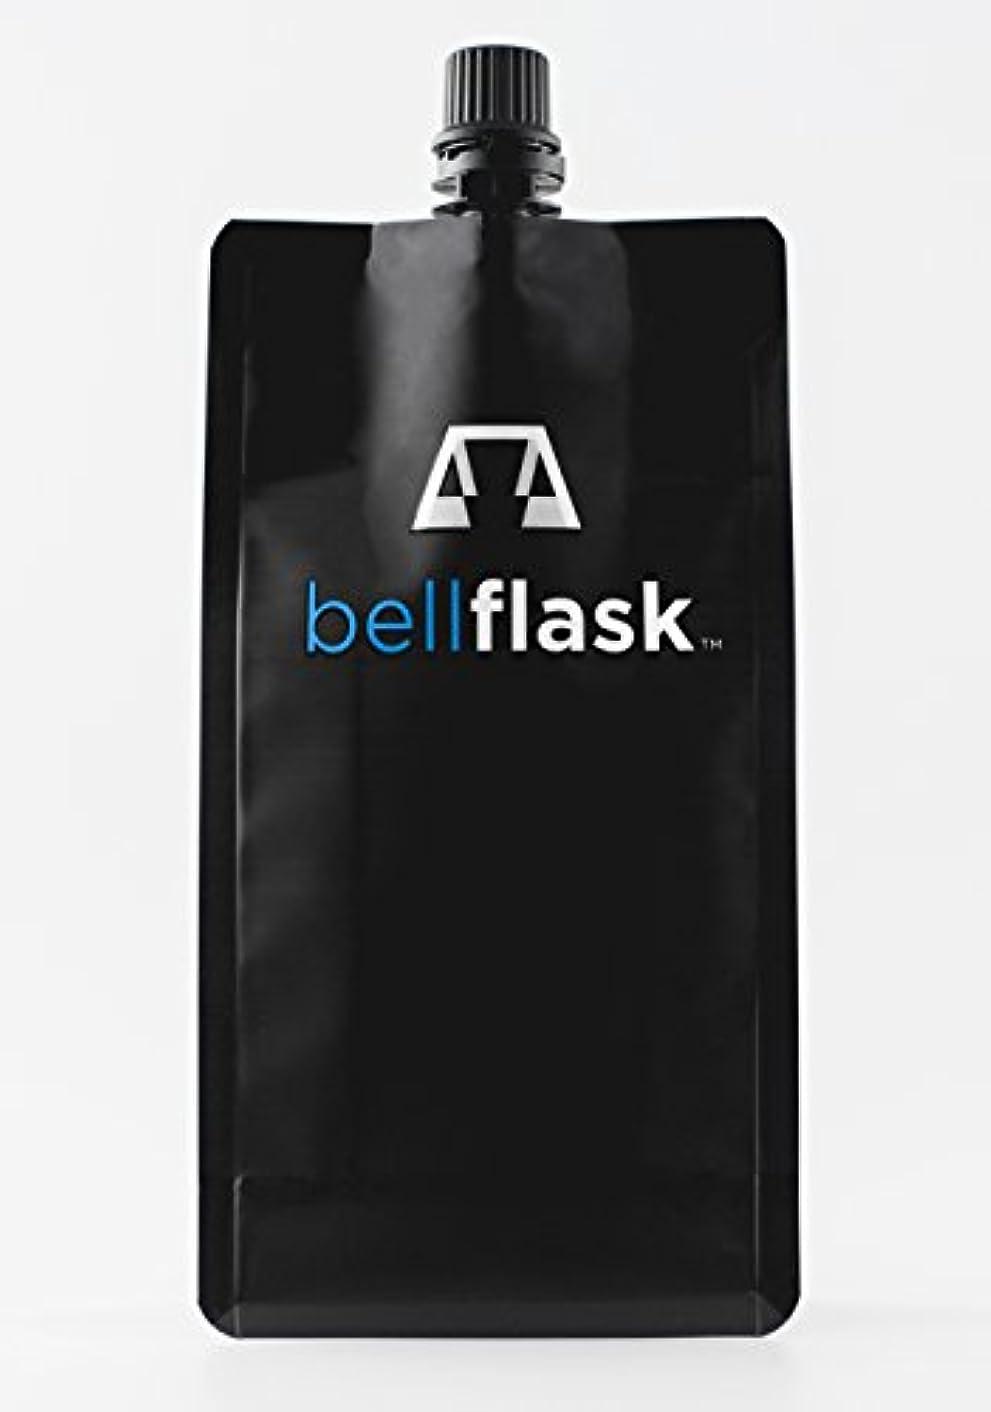 BellFlask - 12 oz. Concealable, Flexible, Reusable, Best, Metal-Free Pack of Three Flasks